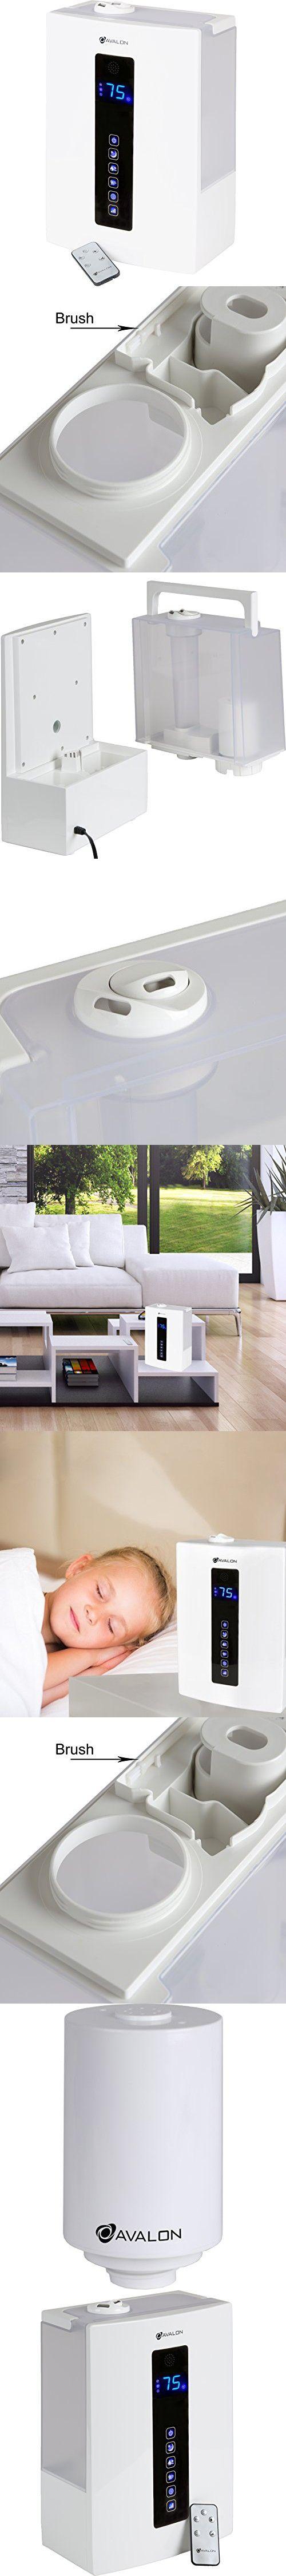 Avalon Premium 5 Liter Ultrasonic Digital Humidifier - Cool/Warm Mist, No Noise, Adjustable Humidity Levels, Remote, Filter, Nightlight, ETL Approved